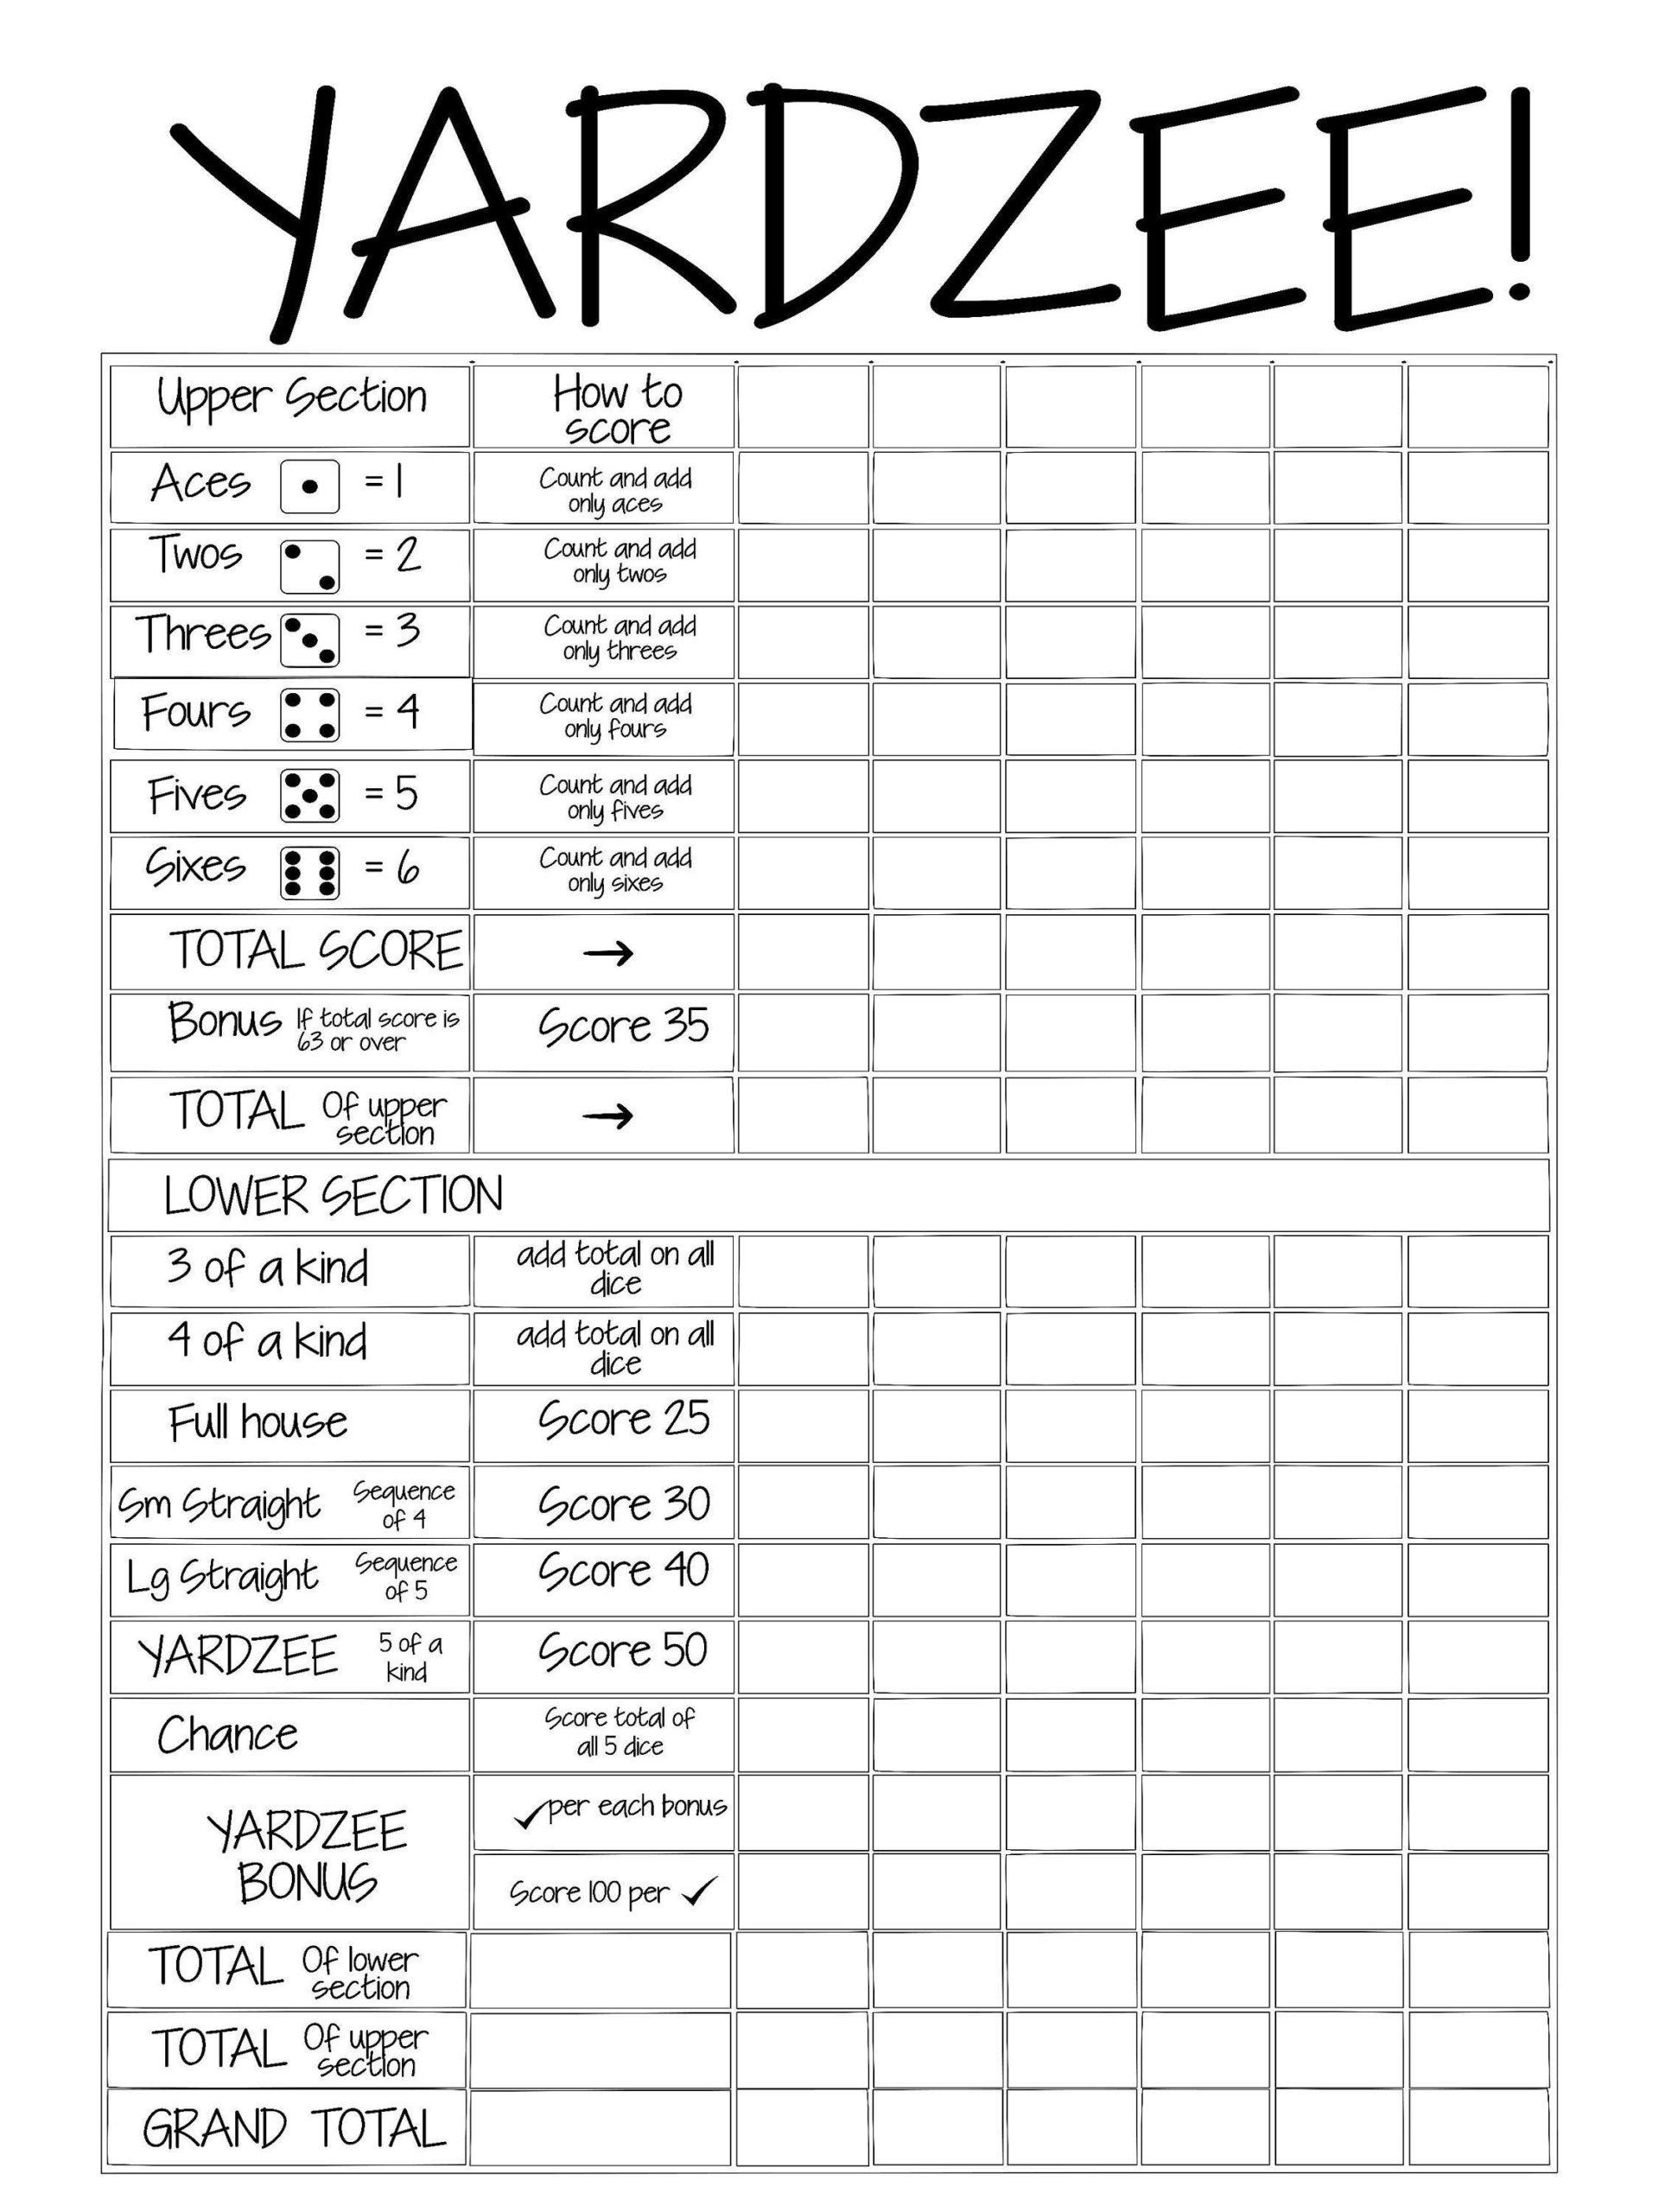 Free Printable Yardzee Score Sheets